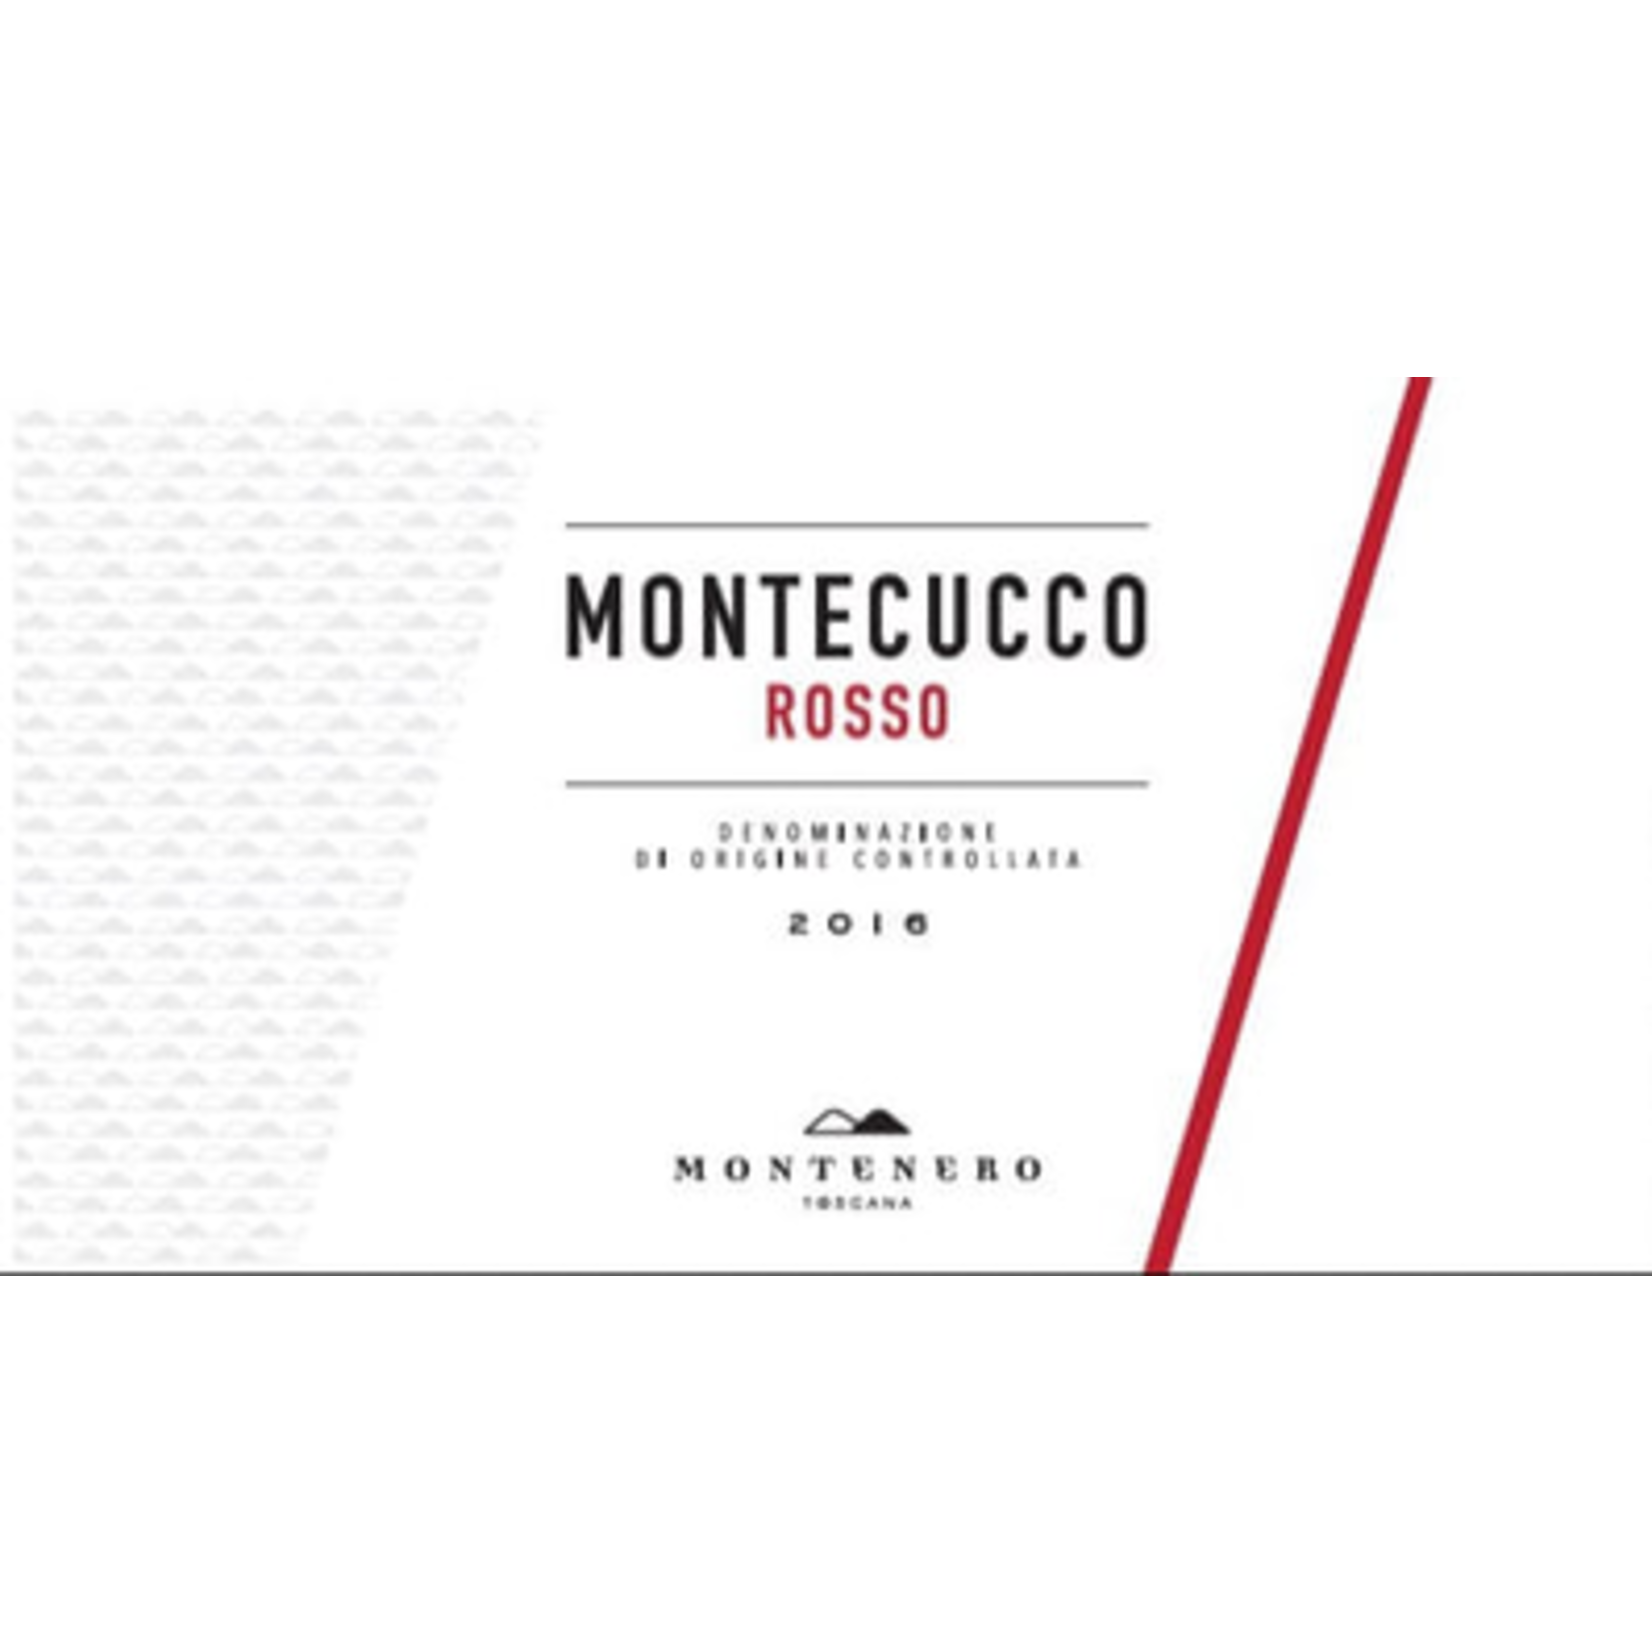 Montecucco Rosso DOC 2016